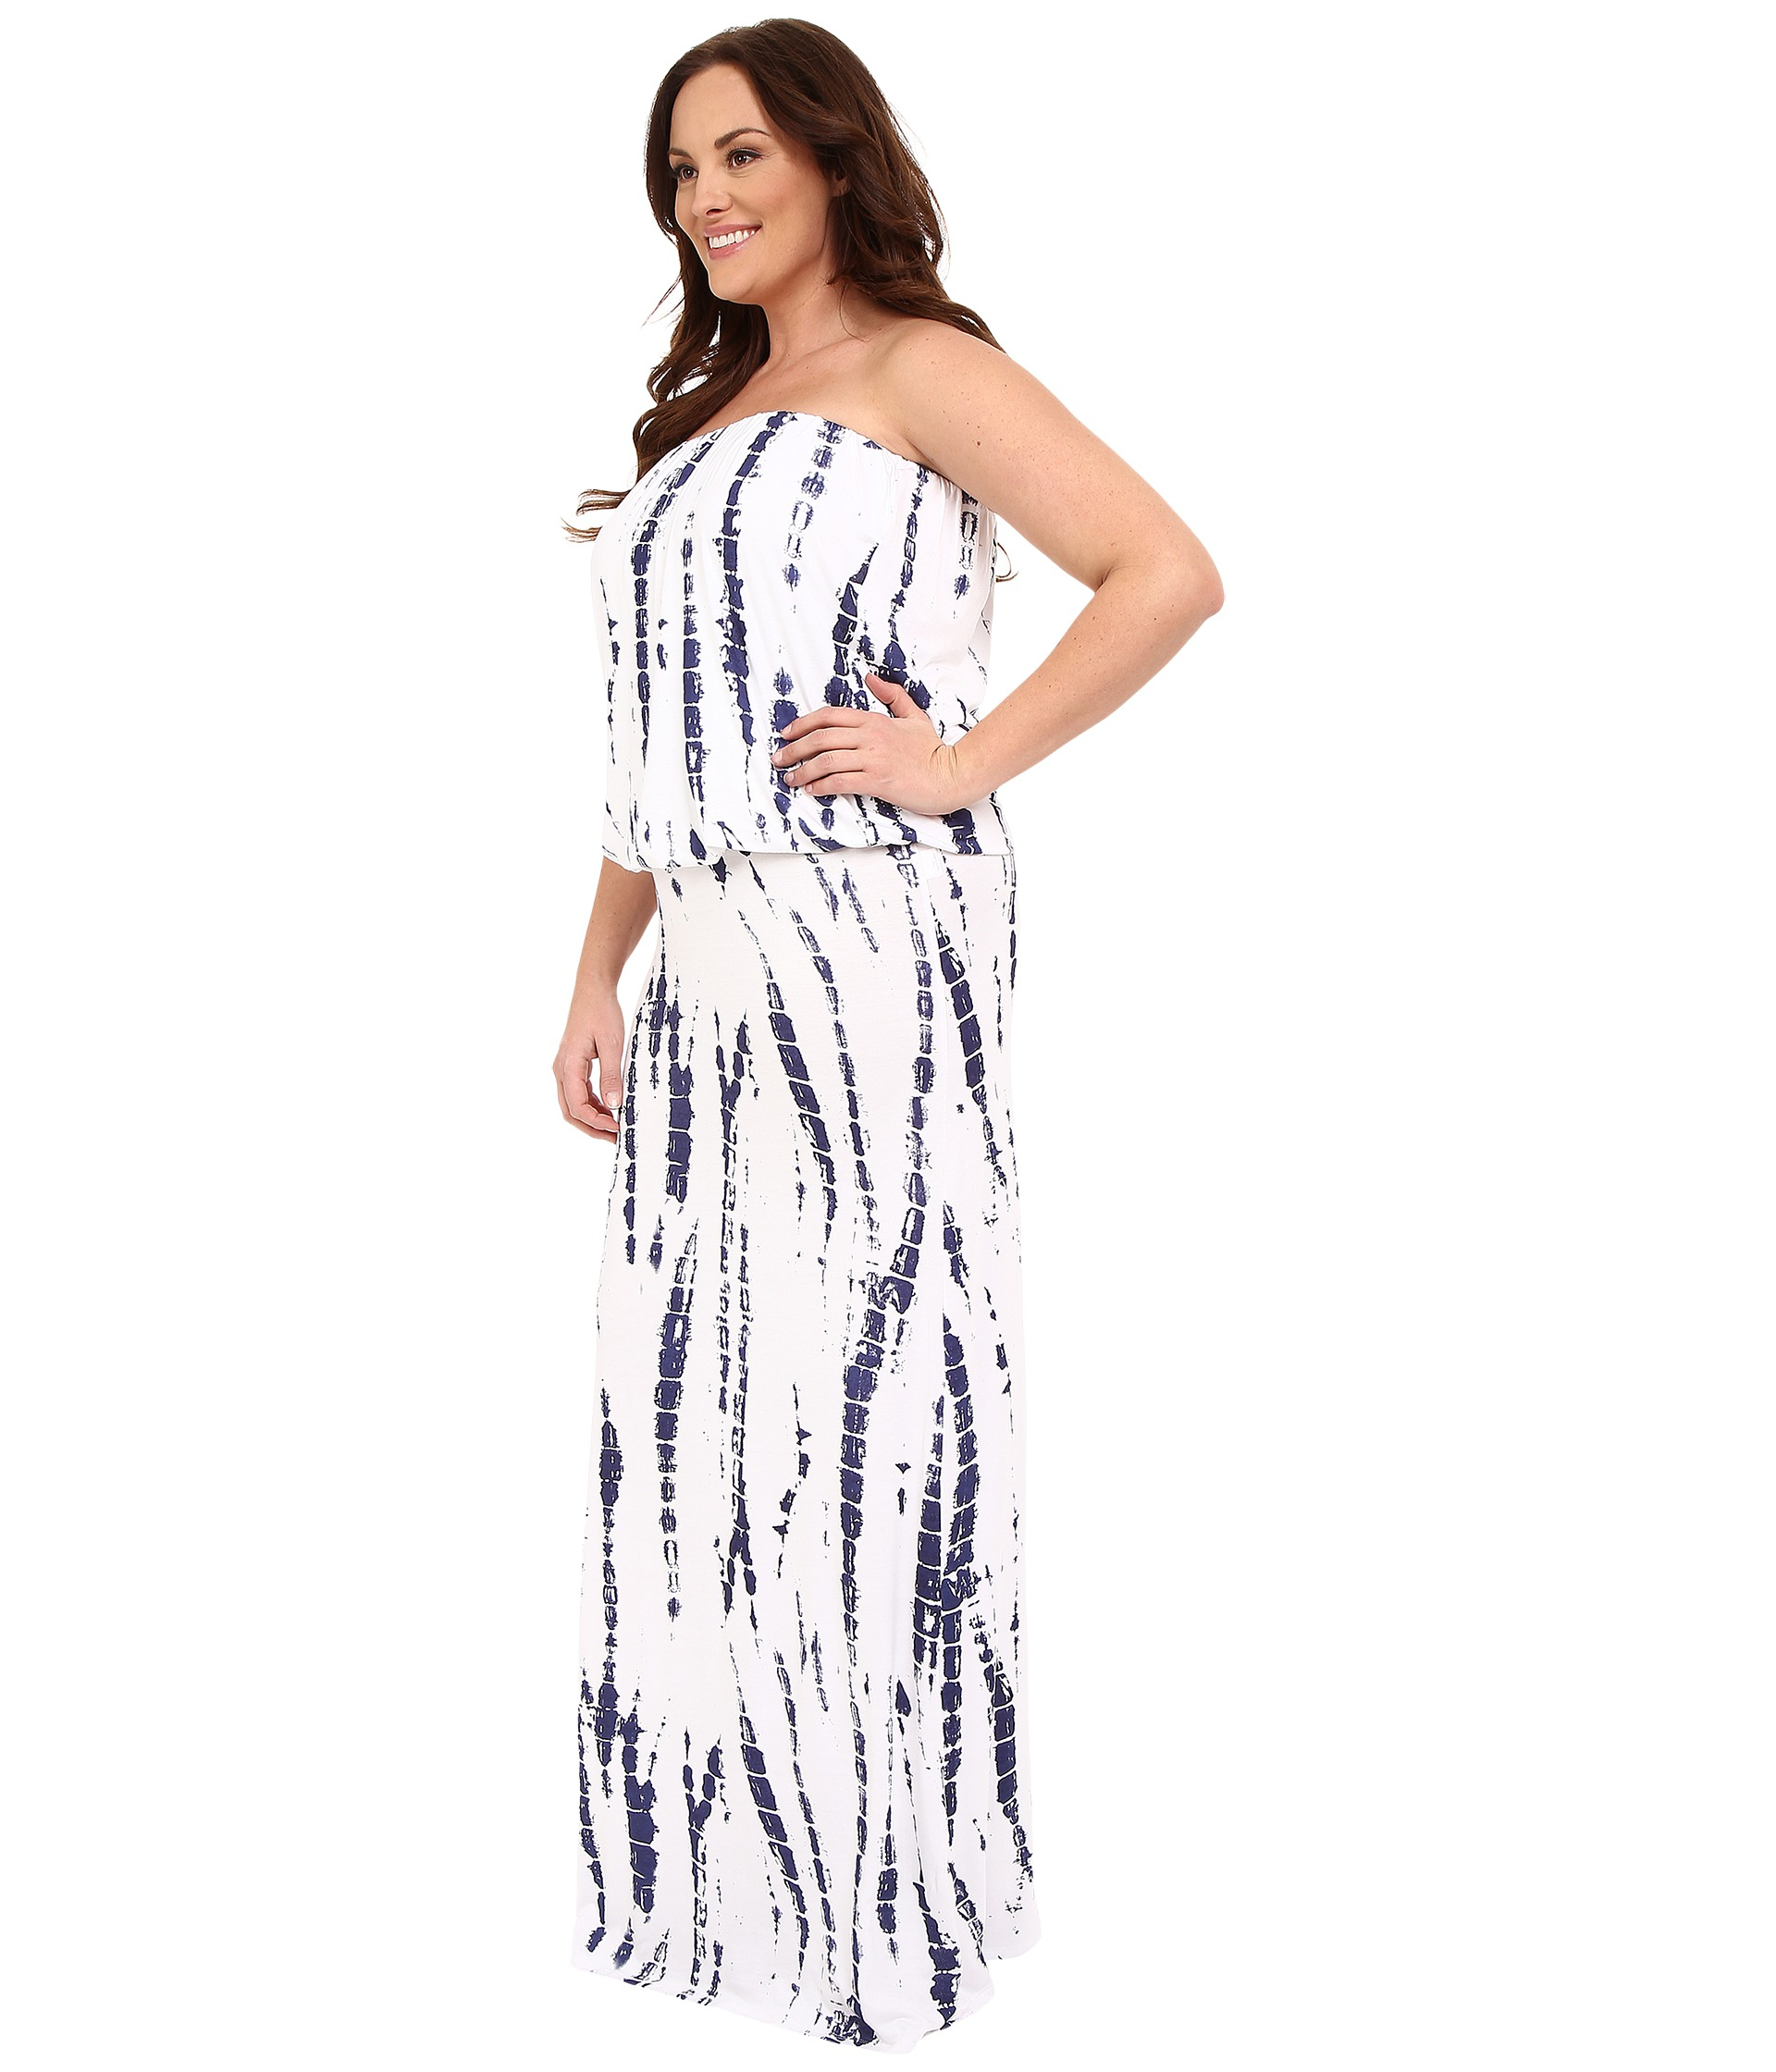 1b13c7aa9d1 Lyst - Culture Phit Plus Size Riena Maxi Dress in White